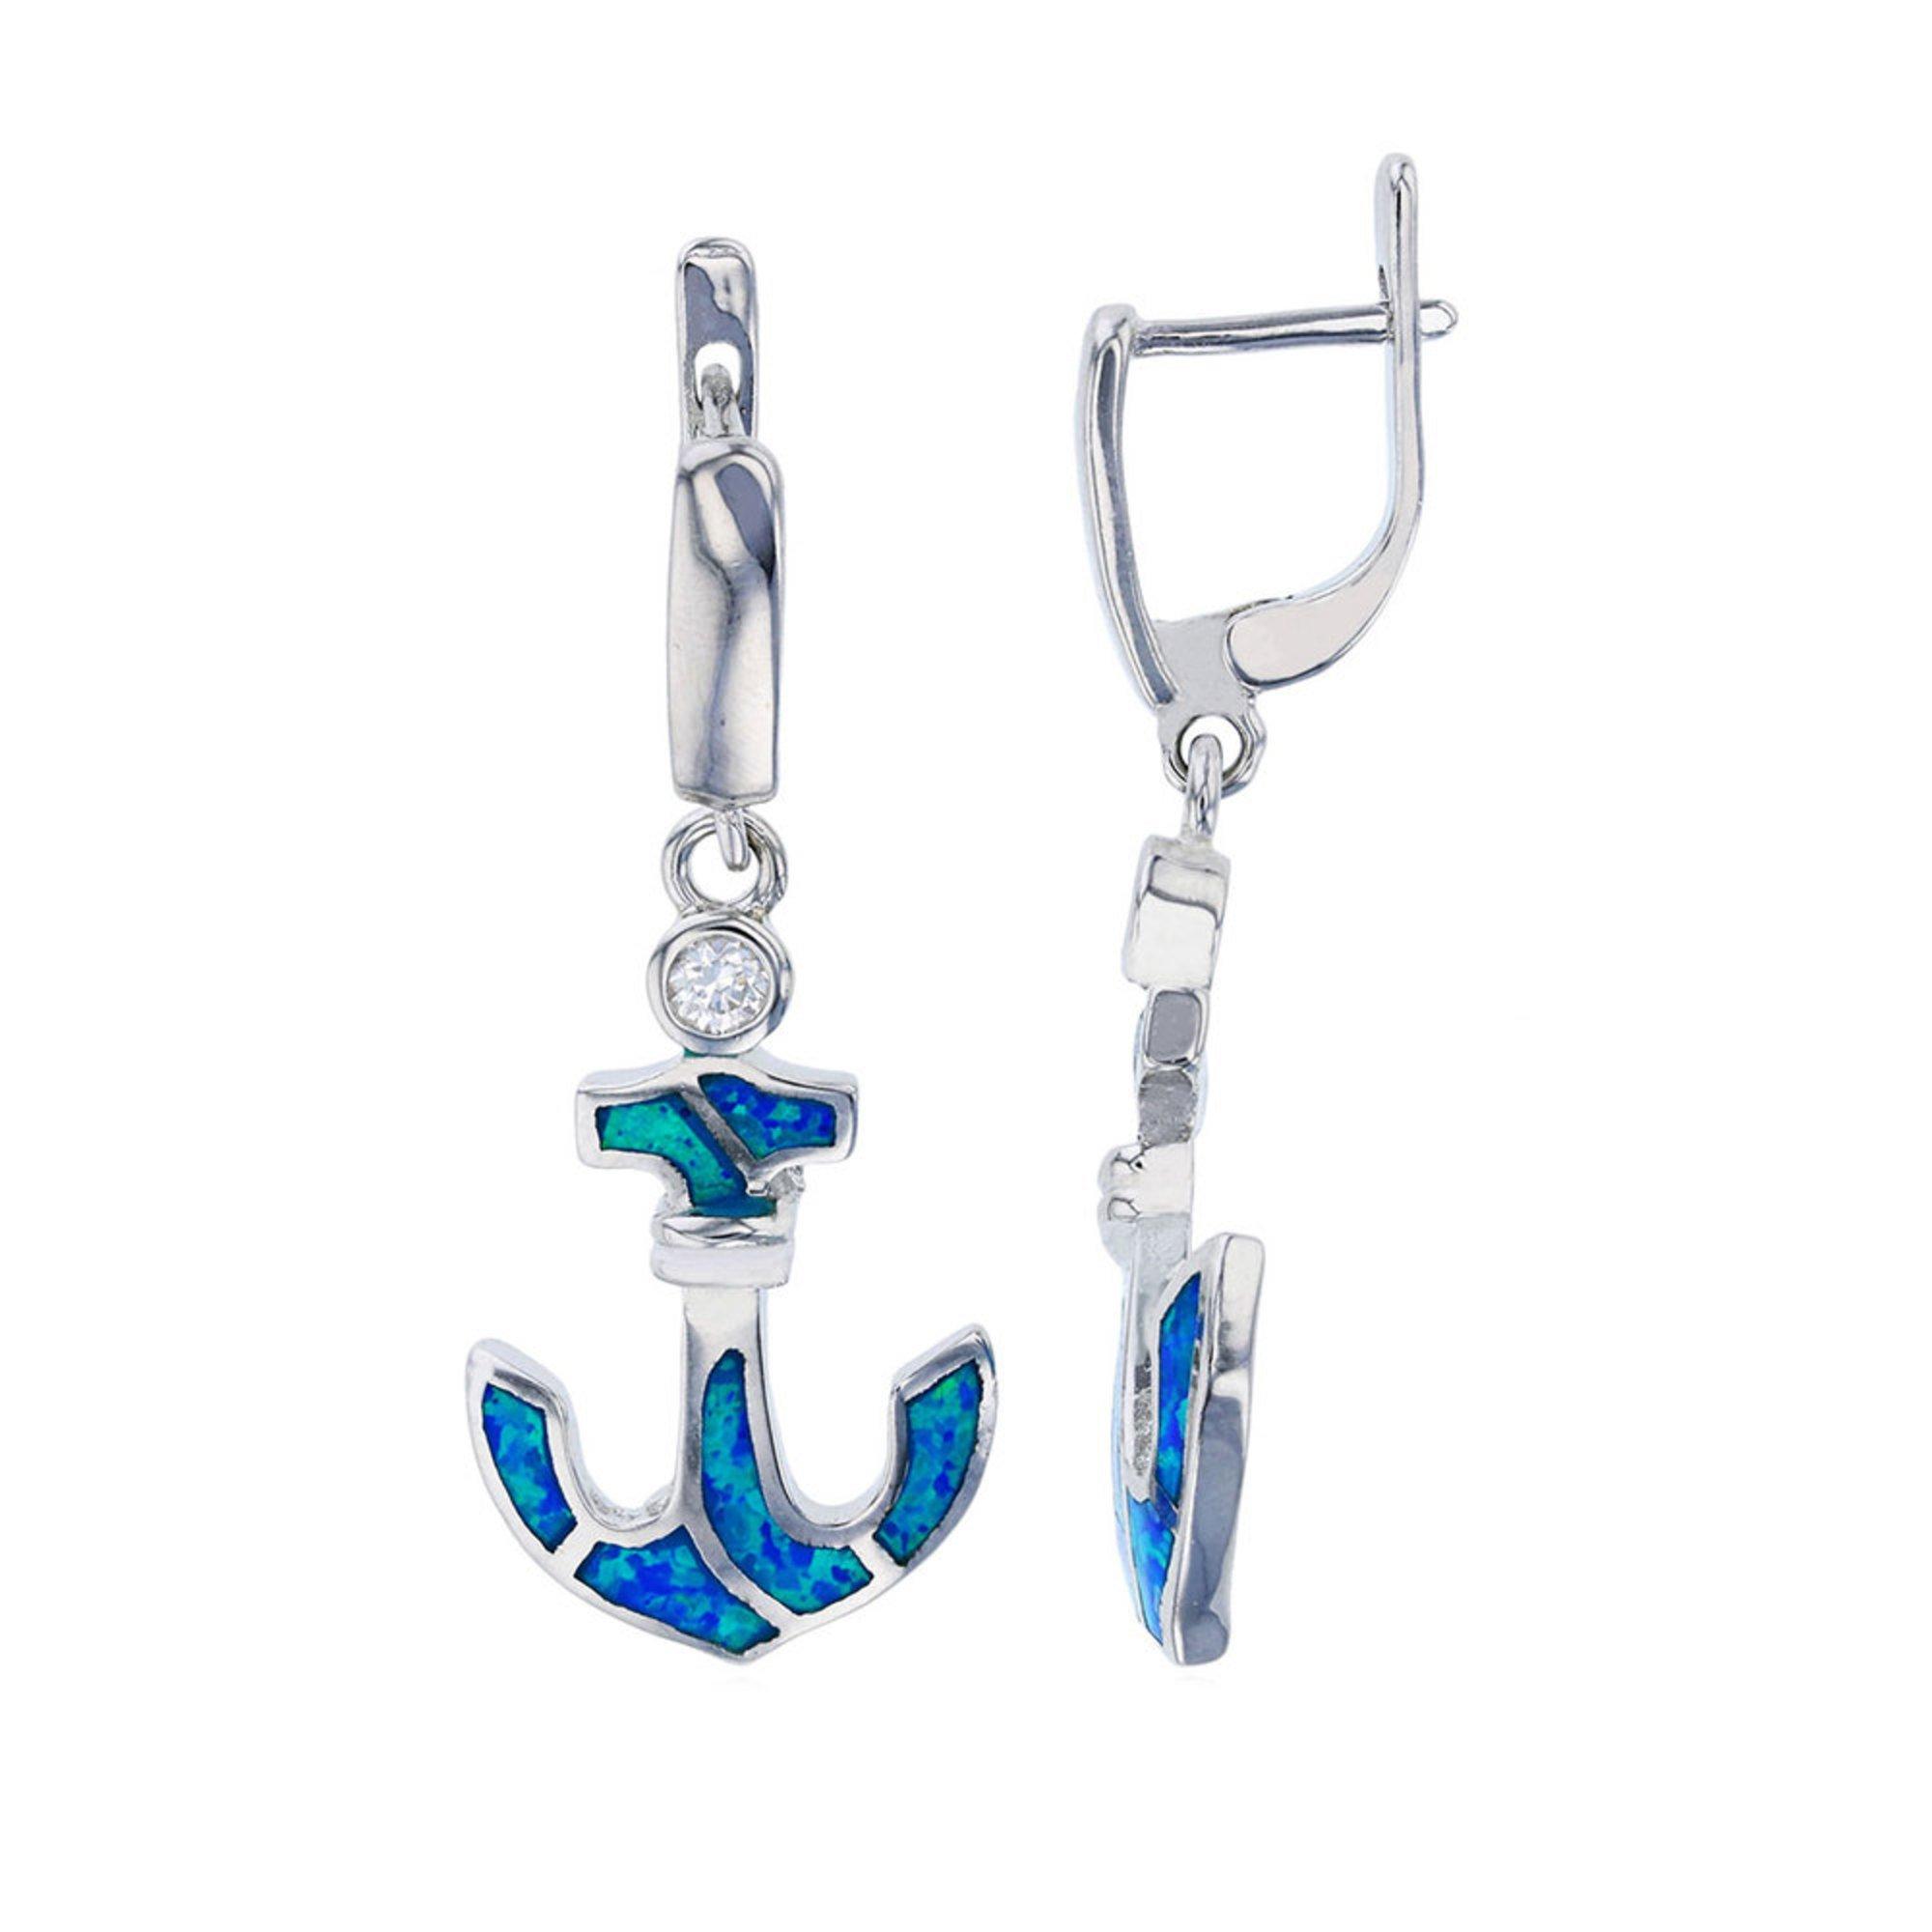 da97a86bf545b Bijoux Du Soleil Created Opal Anchor Earrings, Sterling Silver ...